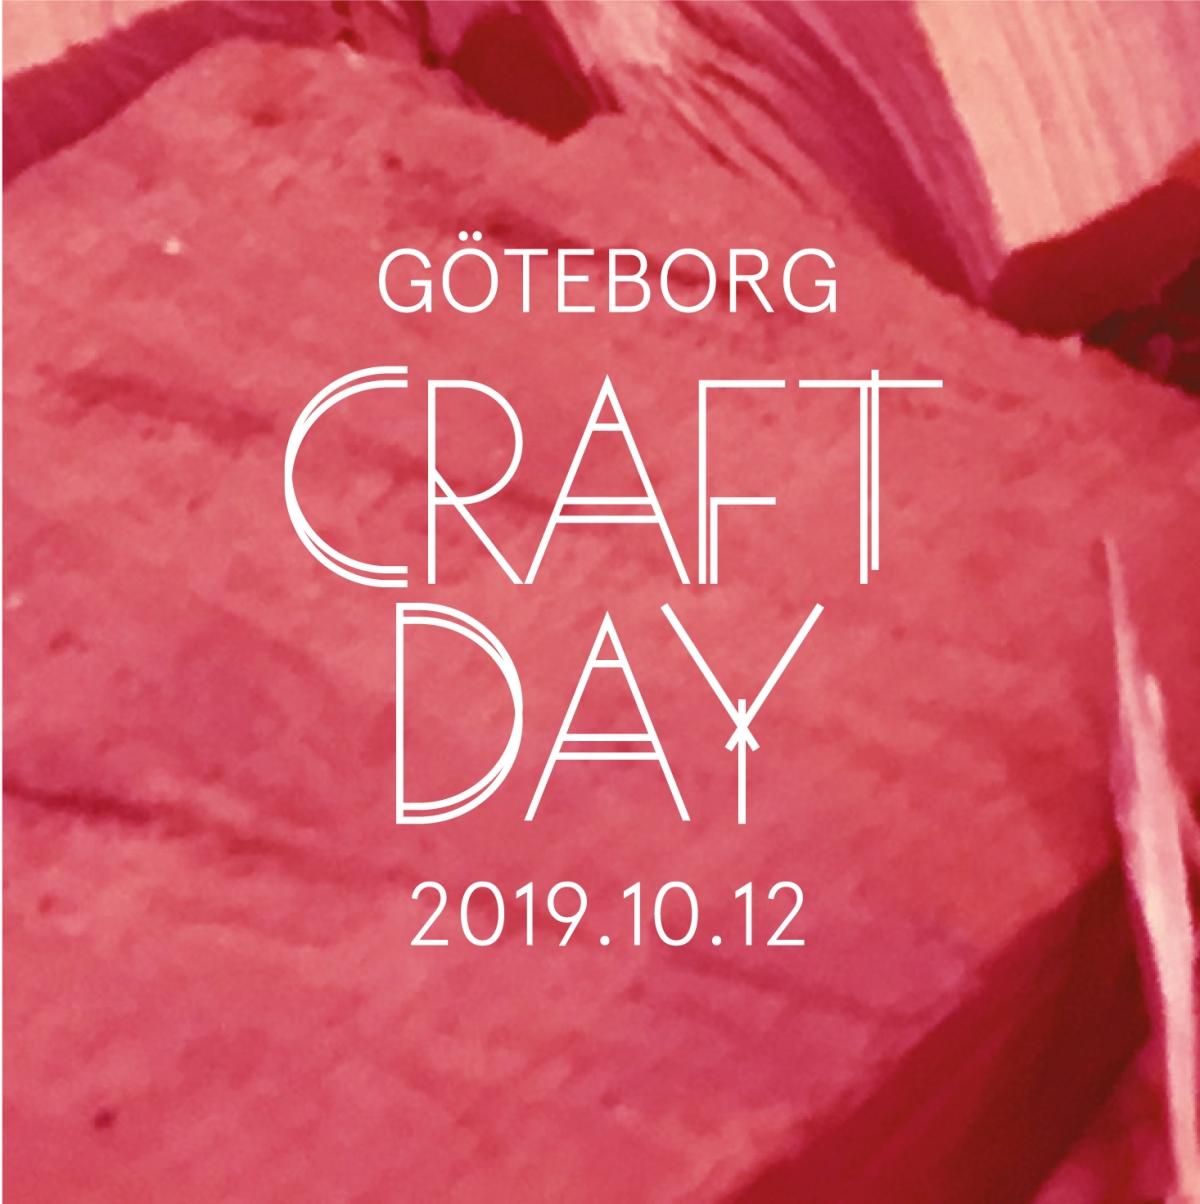 GBG-Craft-Day-2019-web